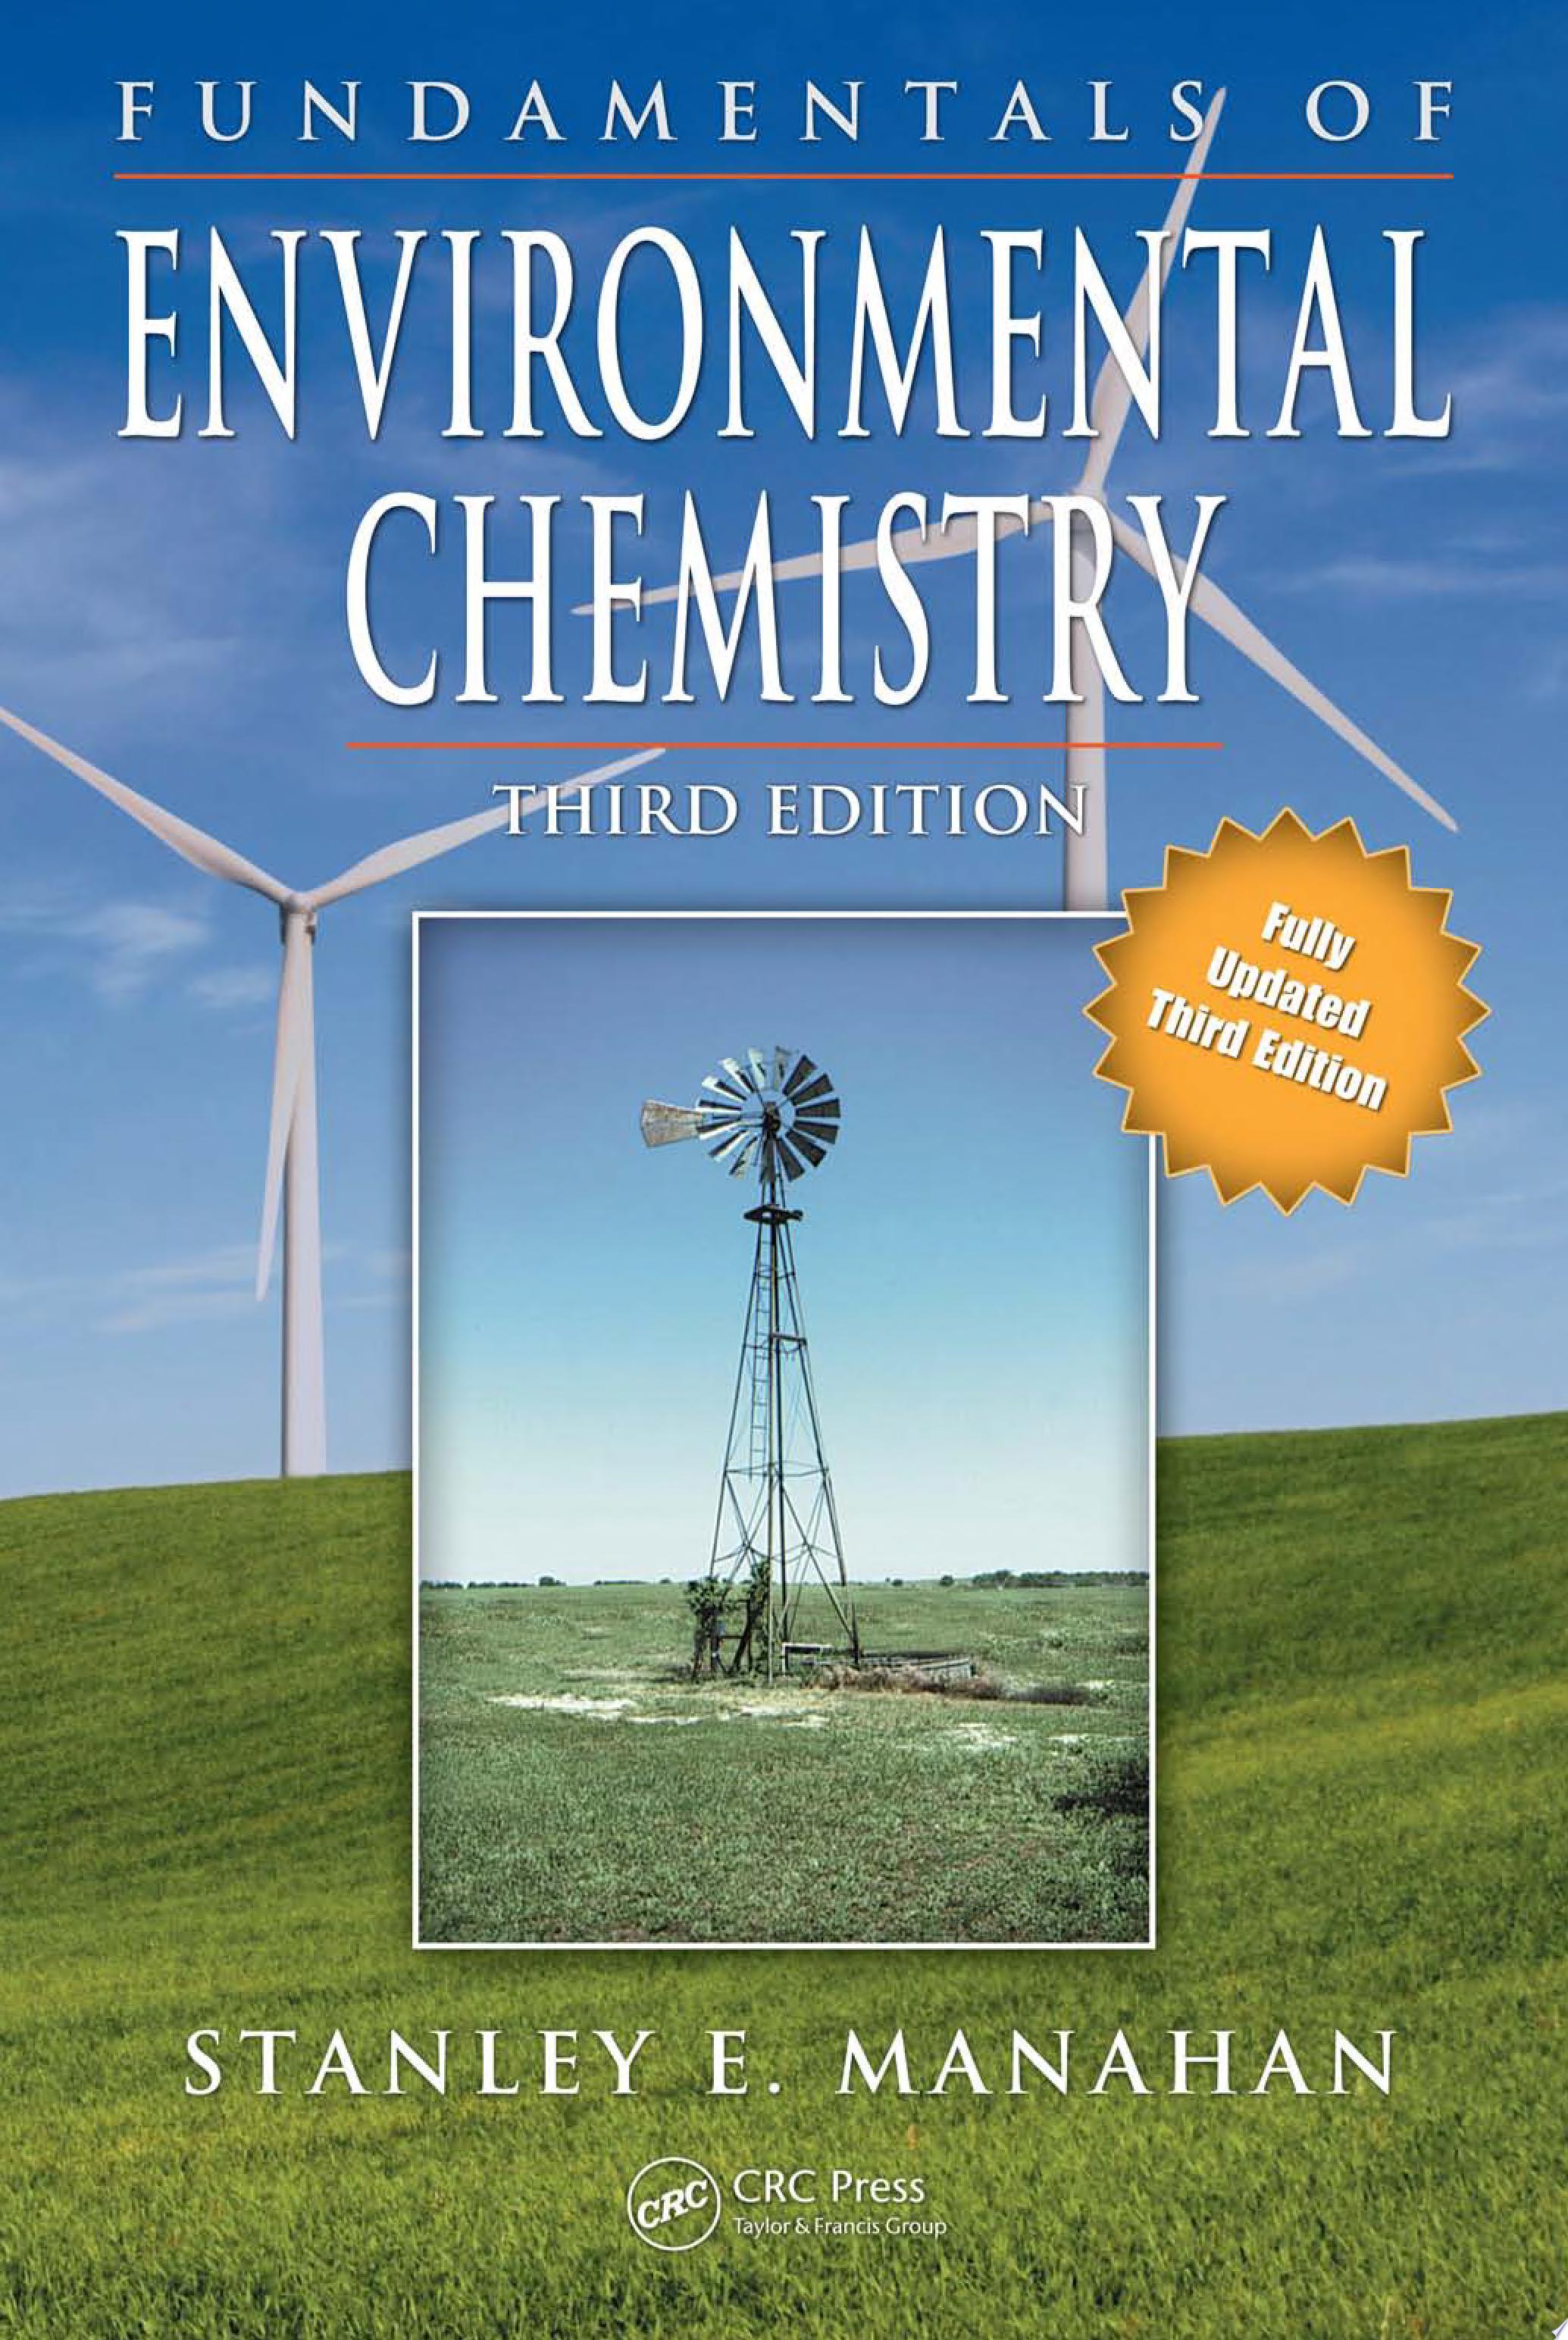 Fundamentals of Environmental Chemistry  Third Edition